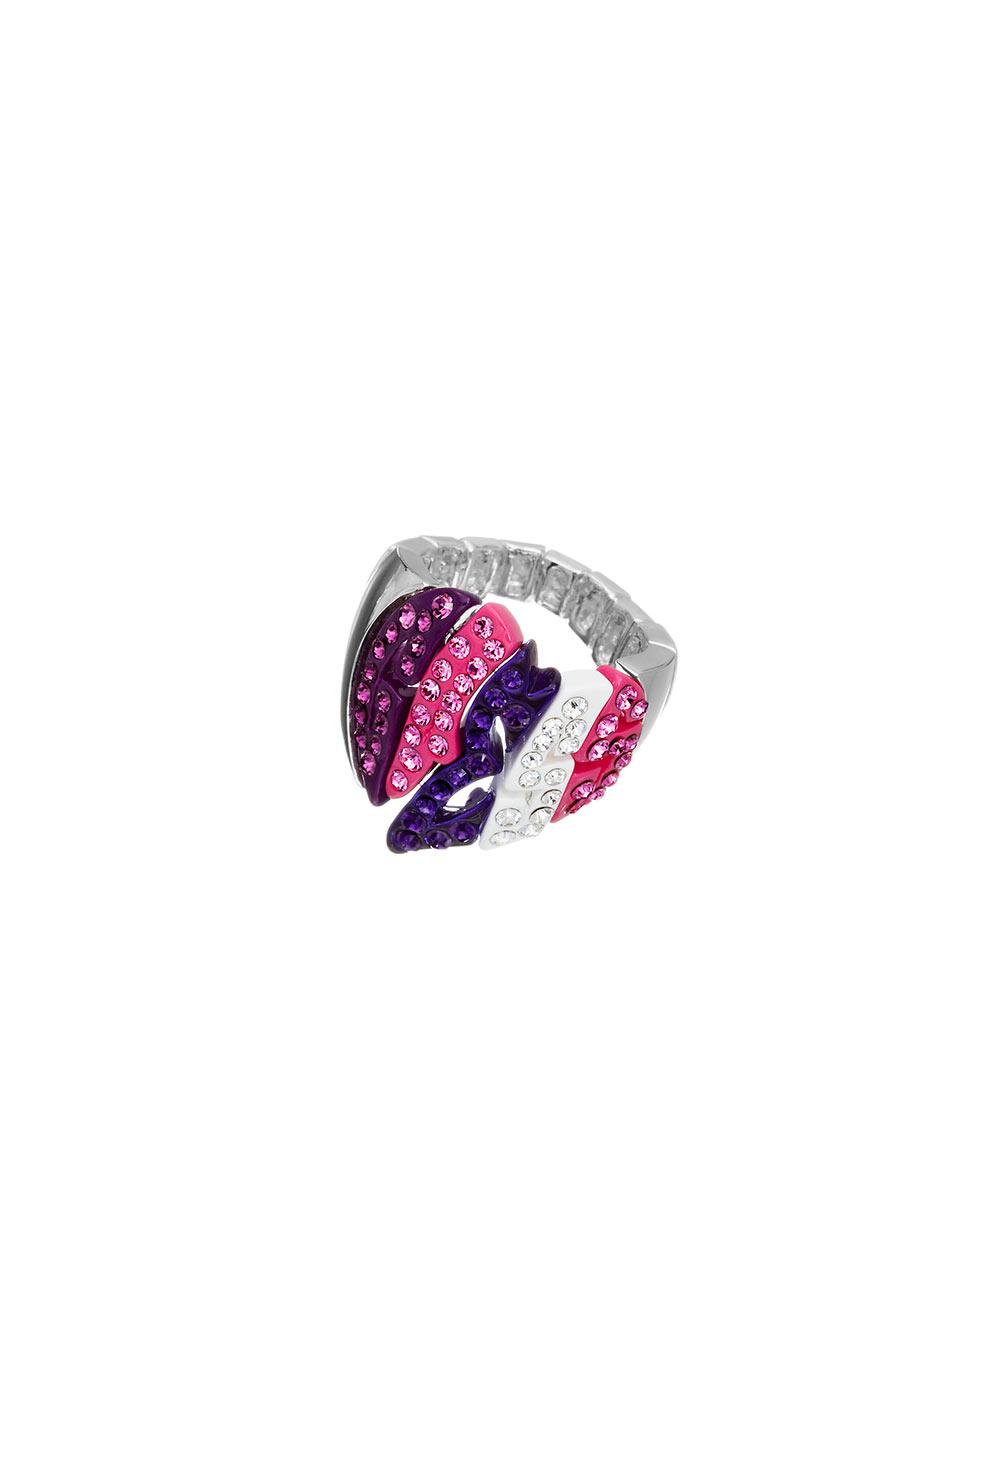 GUESS FAUX UBR41102-S Ασημένιο Δαχτυλίδι Με Πέτρες